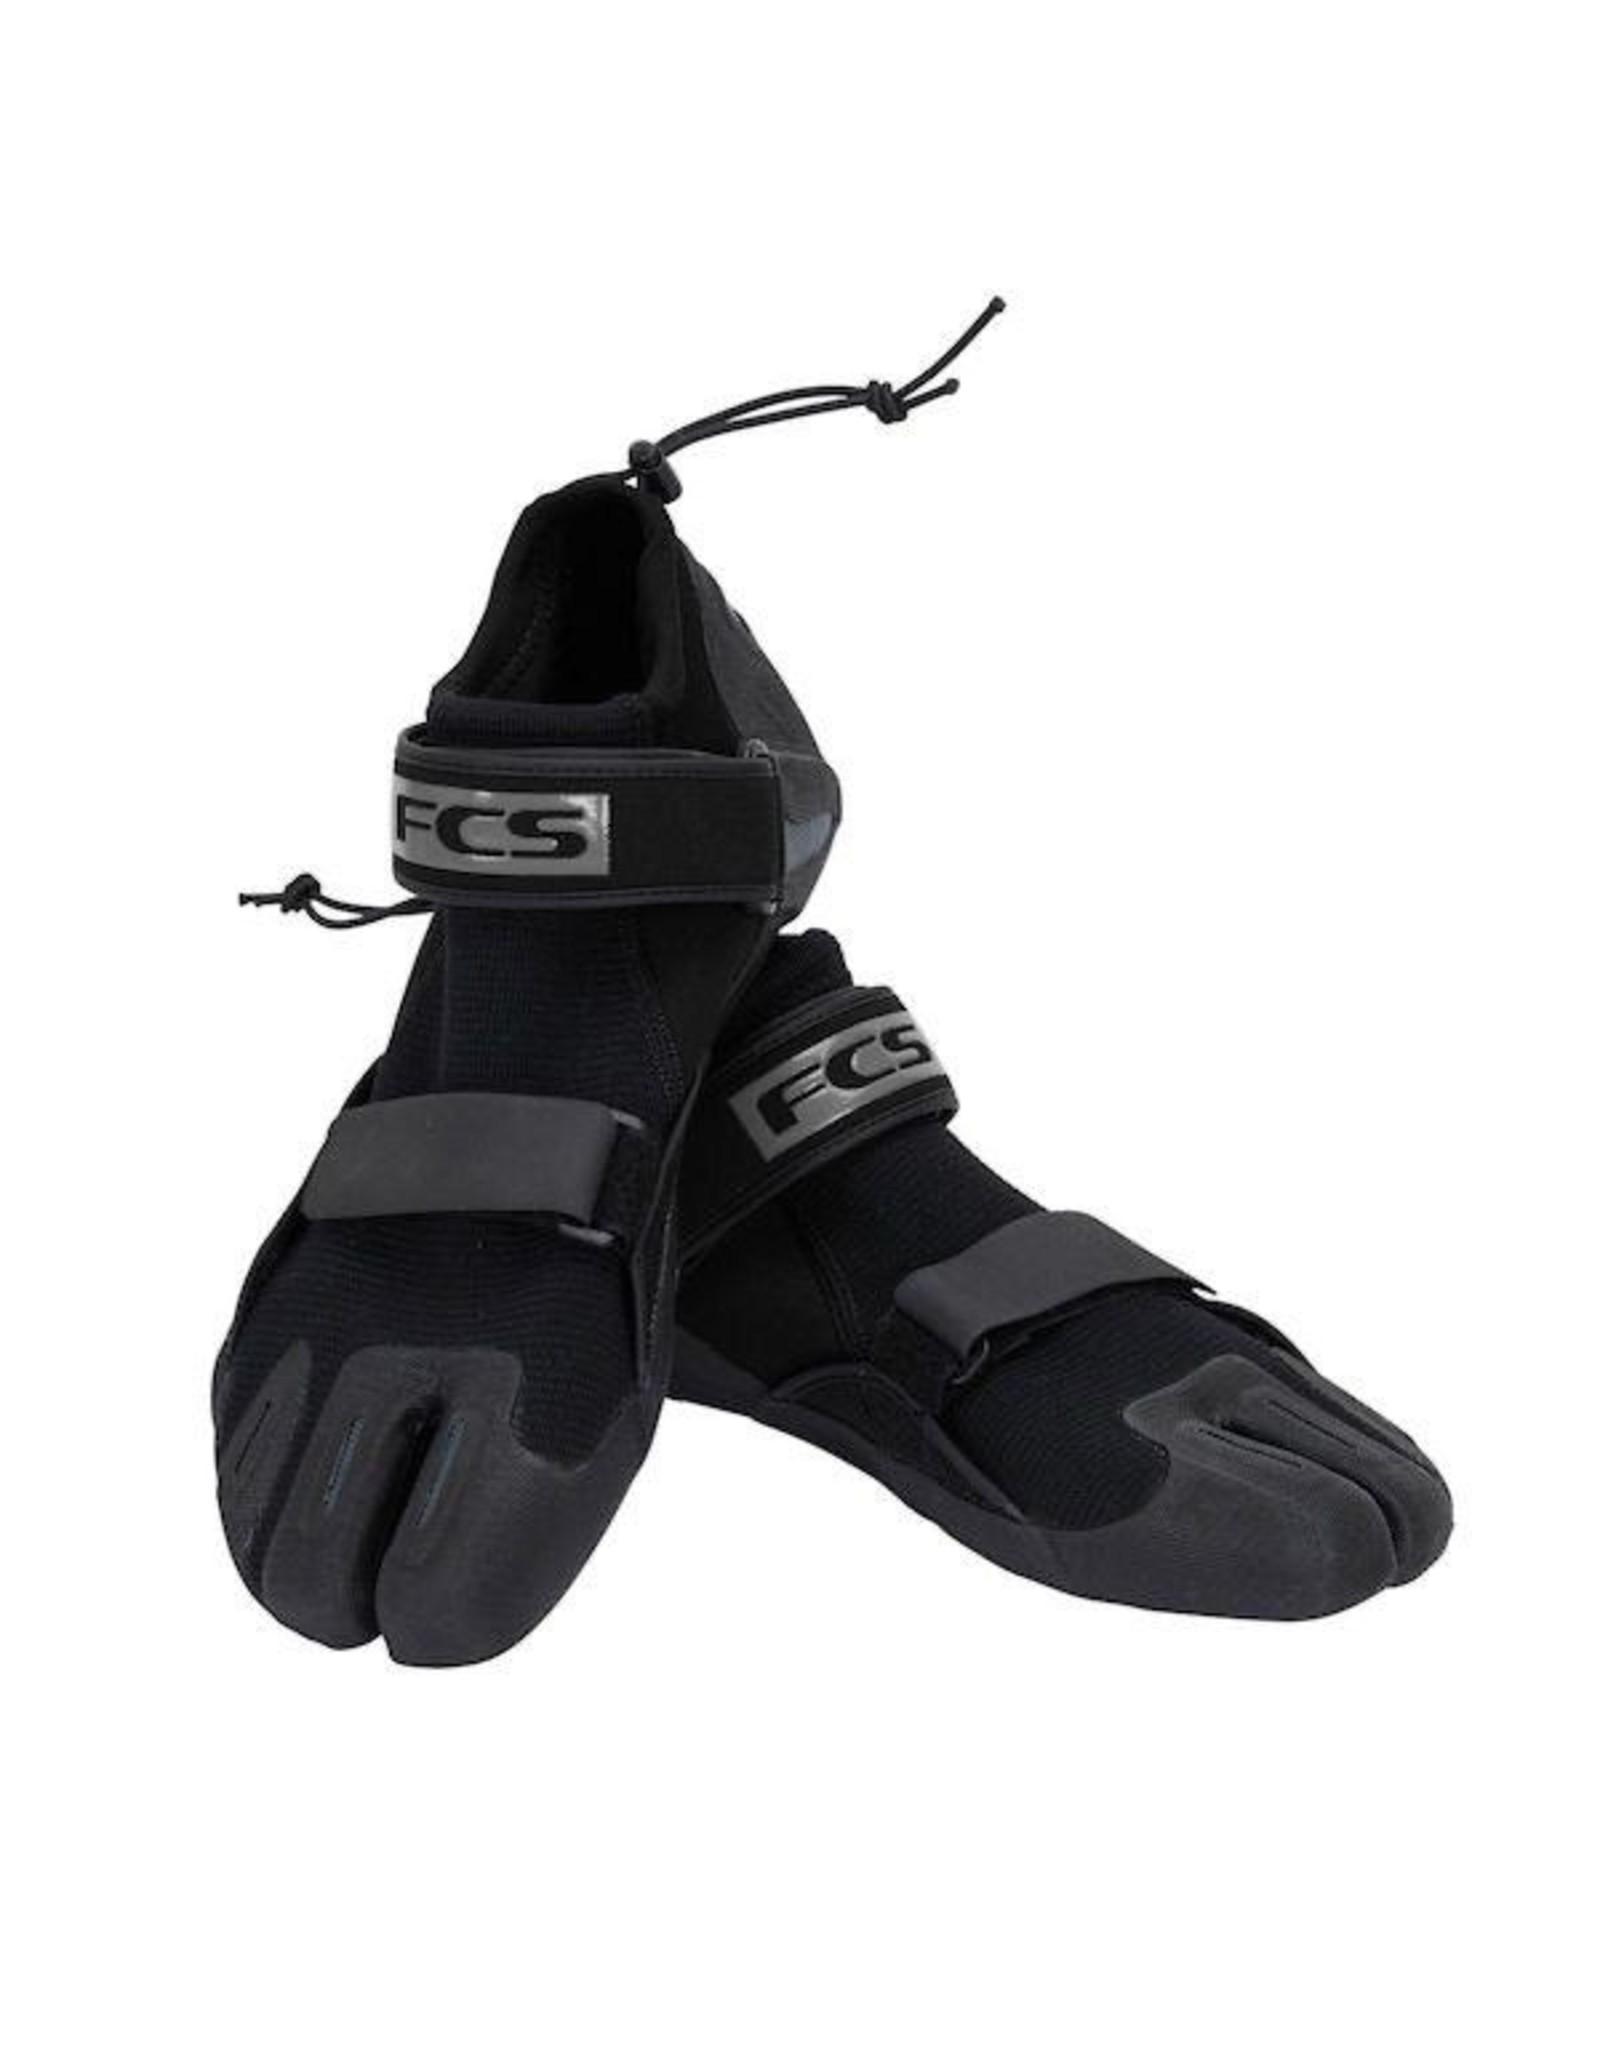 FCS FCS - SP2 - Reef Boot - 6/39 - Black